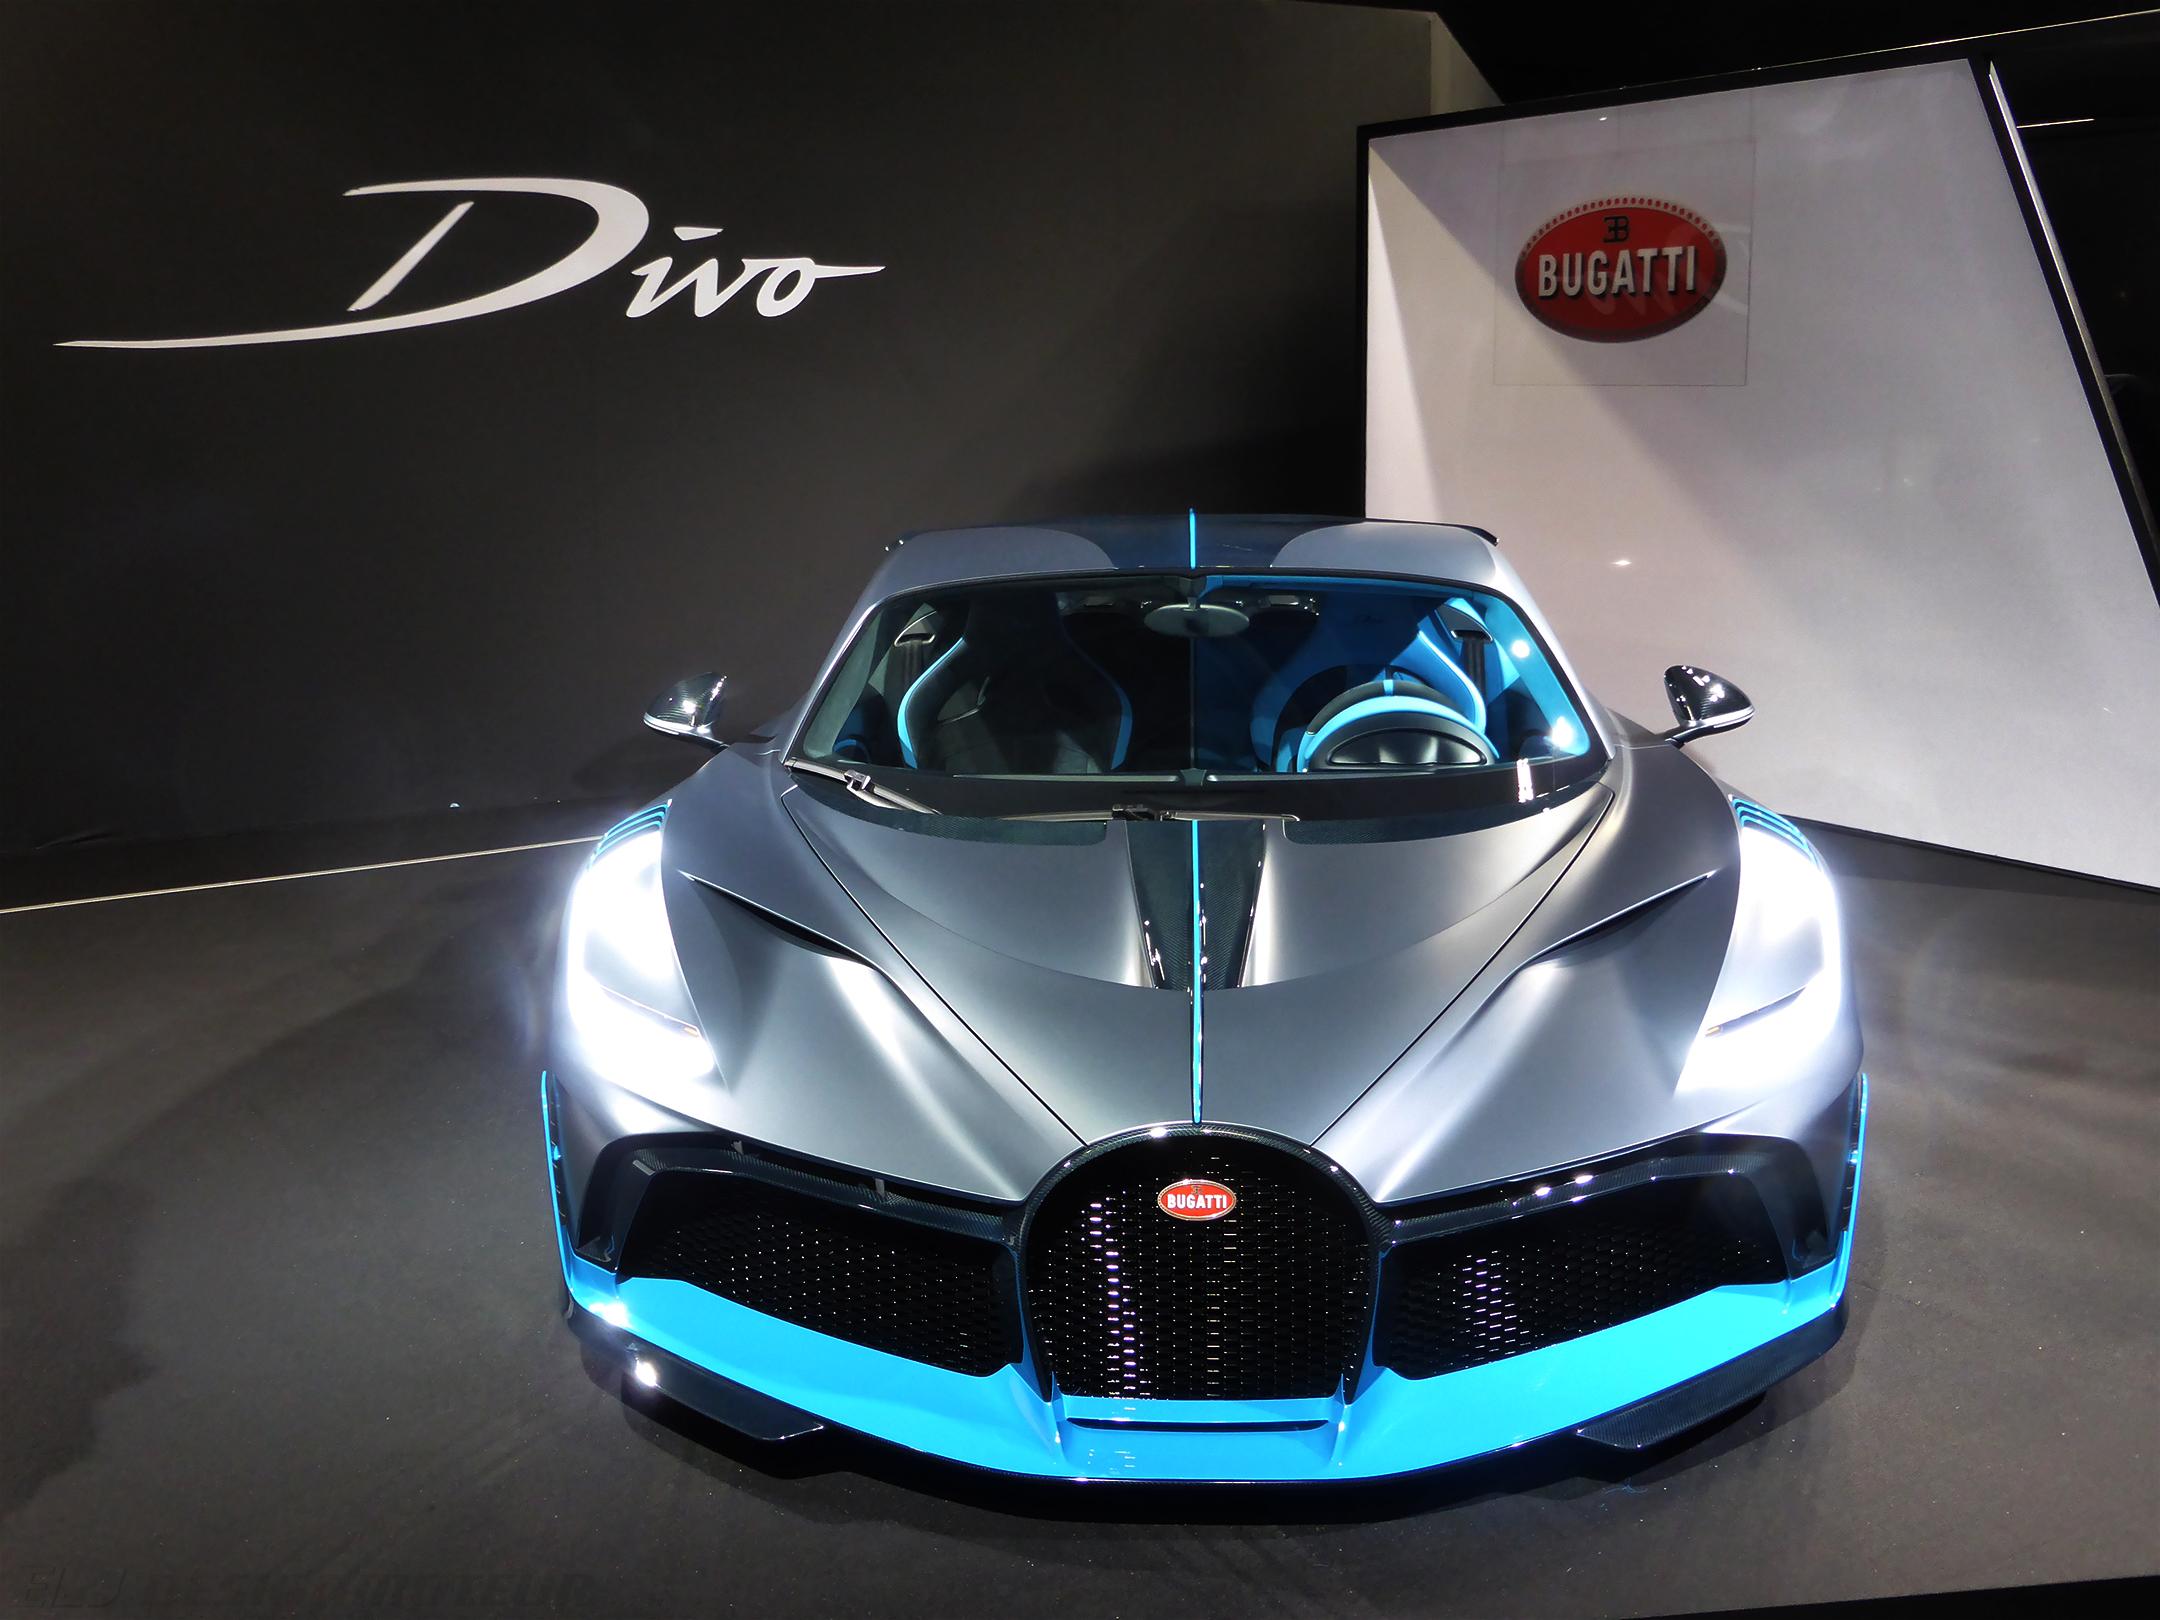 Bugatti Divo - front face - Paris Motor Show - 2018 - Mondial Auto - photo ELJ DESIGNMOTEURBugatti Divo - front face - Paris Motor Show - 2018 - Mondial Auto - photo ELJ DESIGNMOTEUR